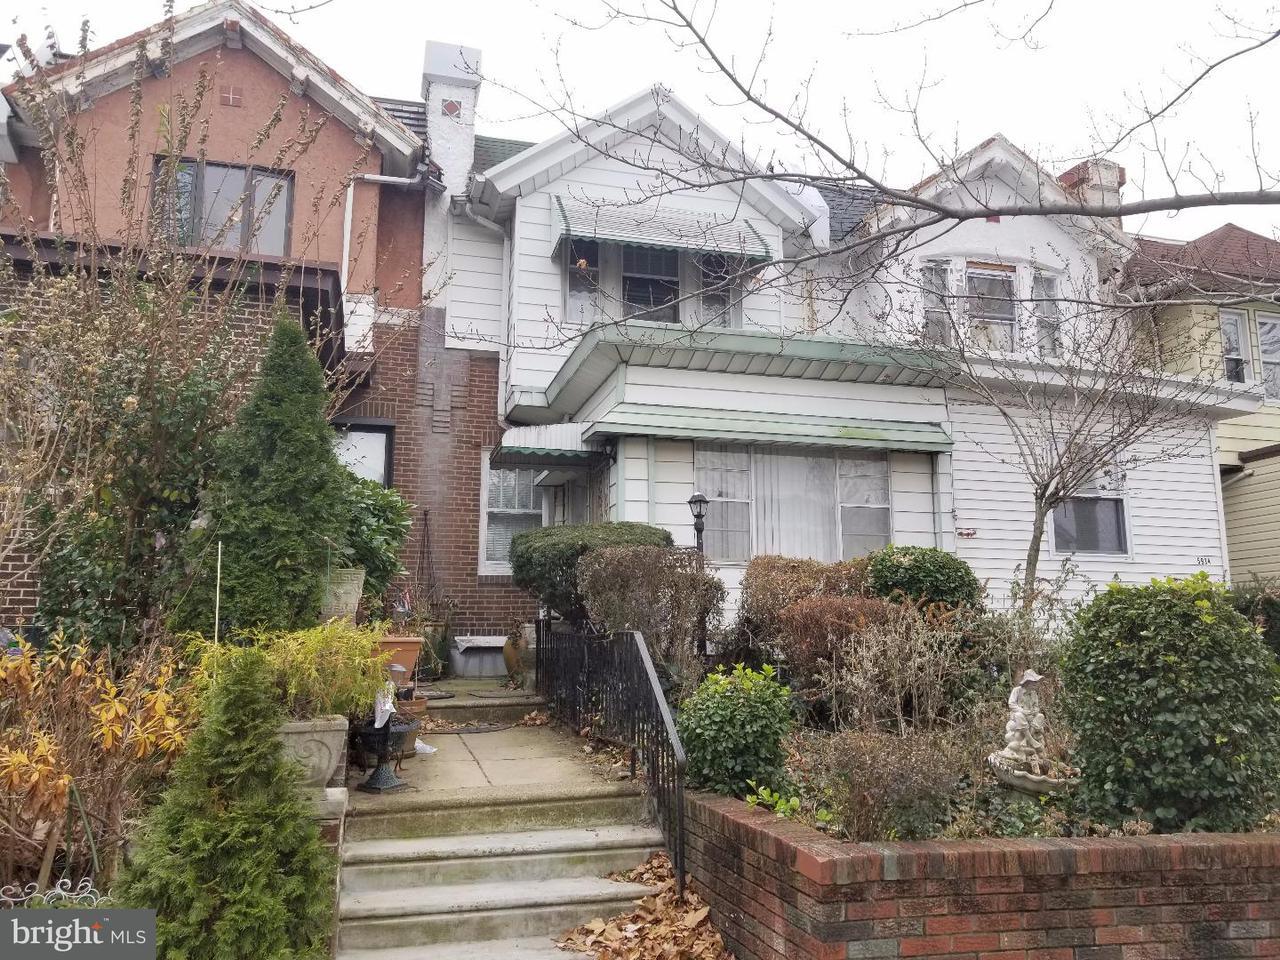 5932 W Jefferson Philadelphia , PA 19151